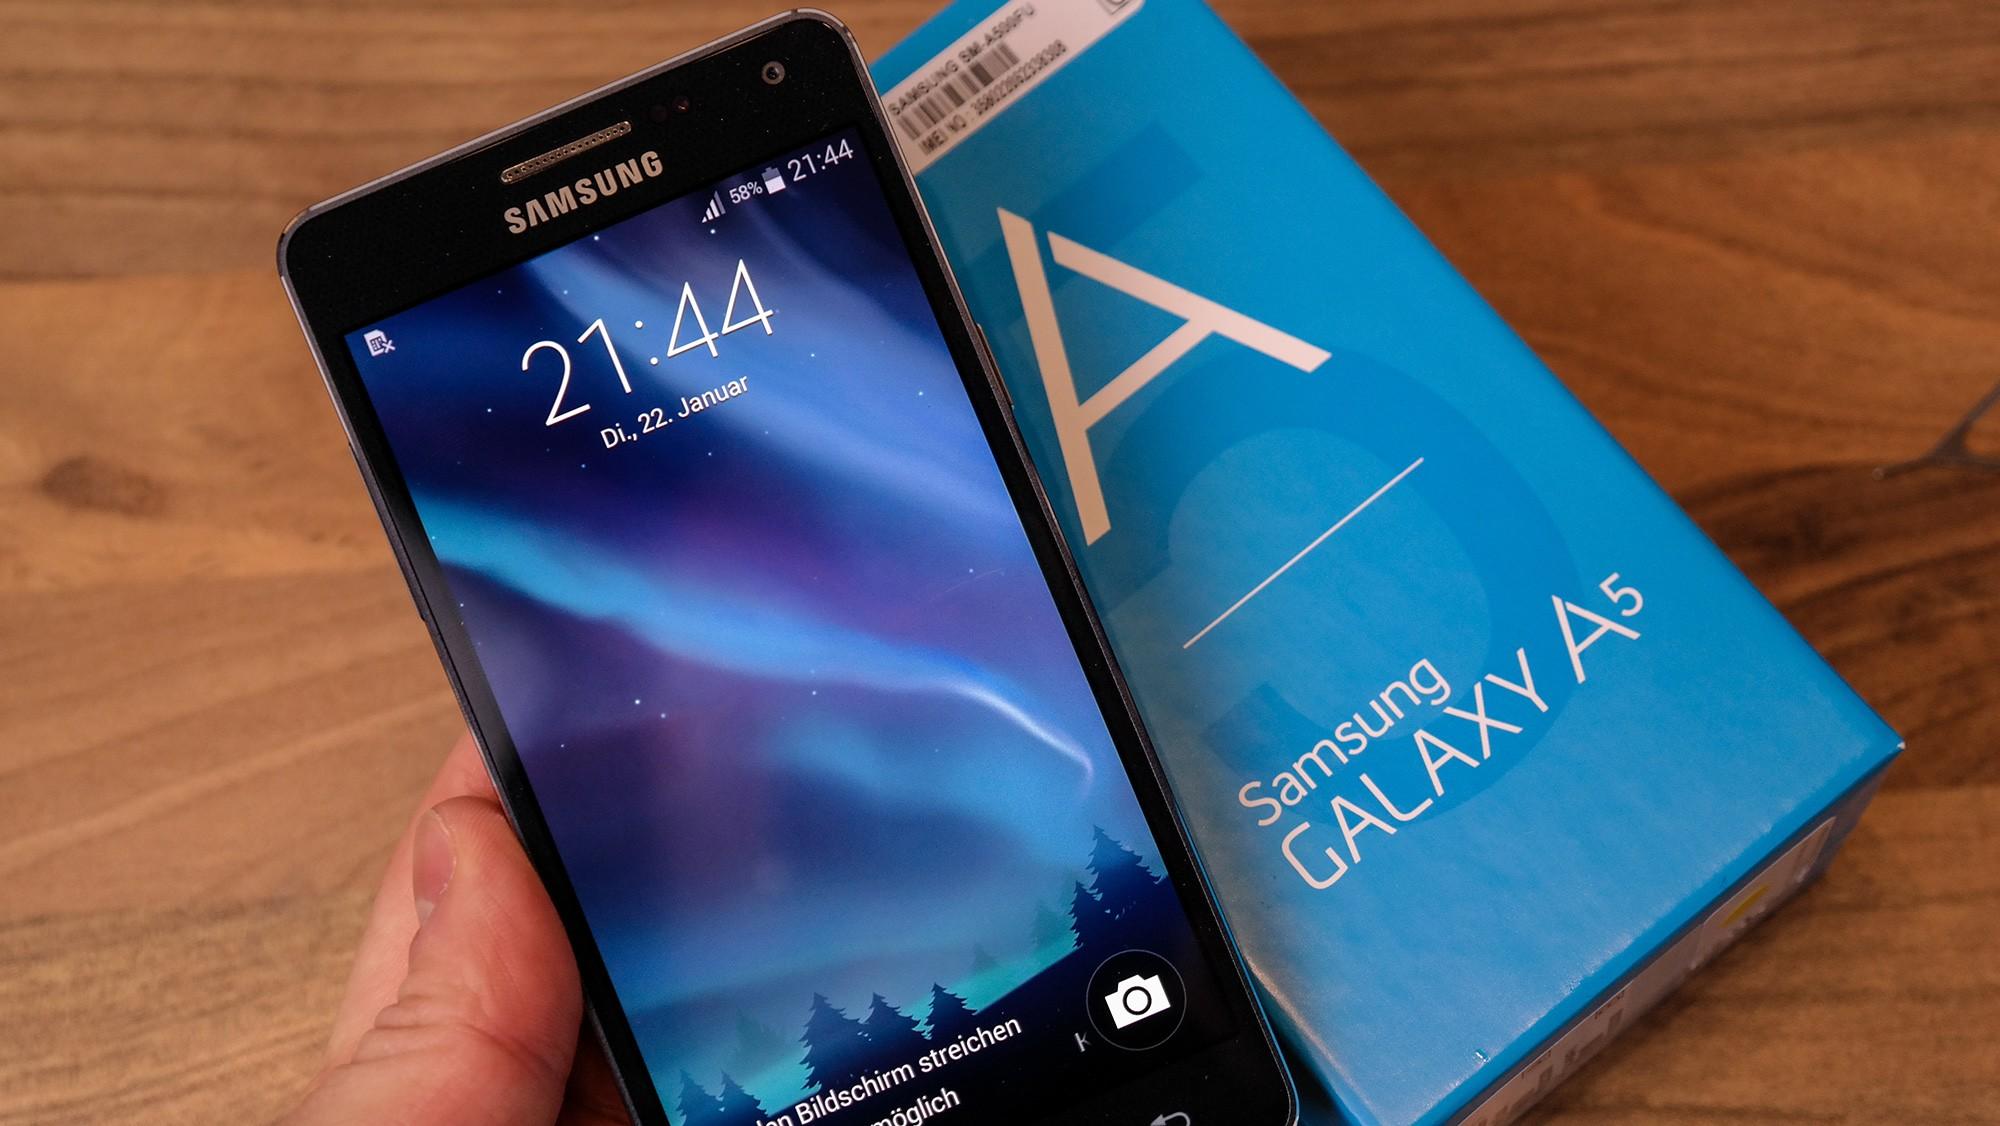 Galaxy A5 - Mẫu máy kế thừa Galaxy A5 hé lộ trong GFXBench